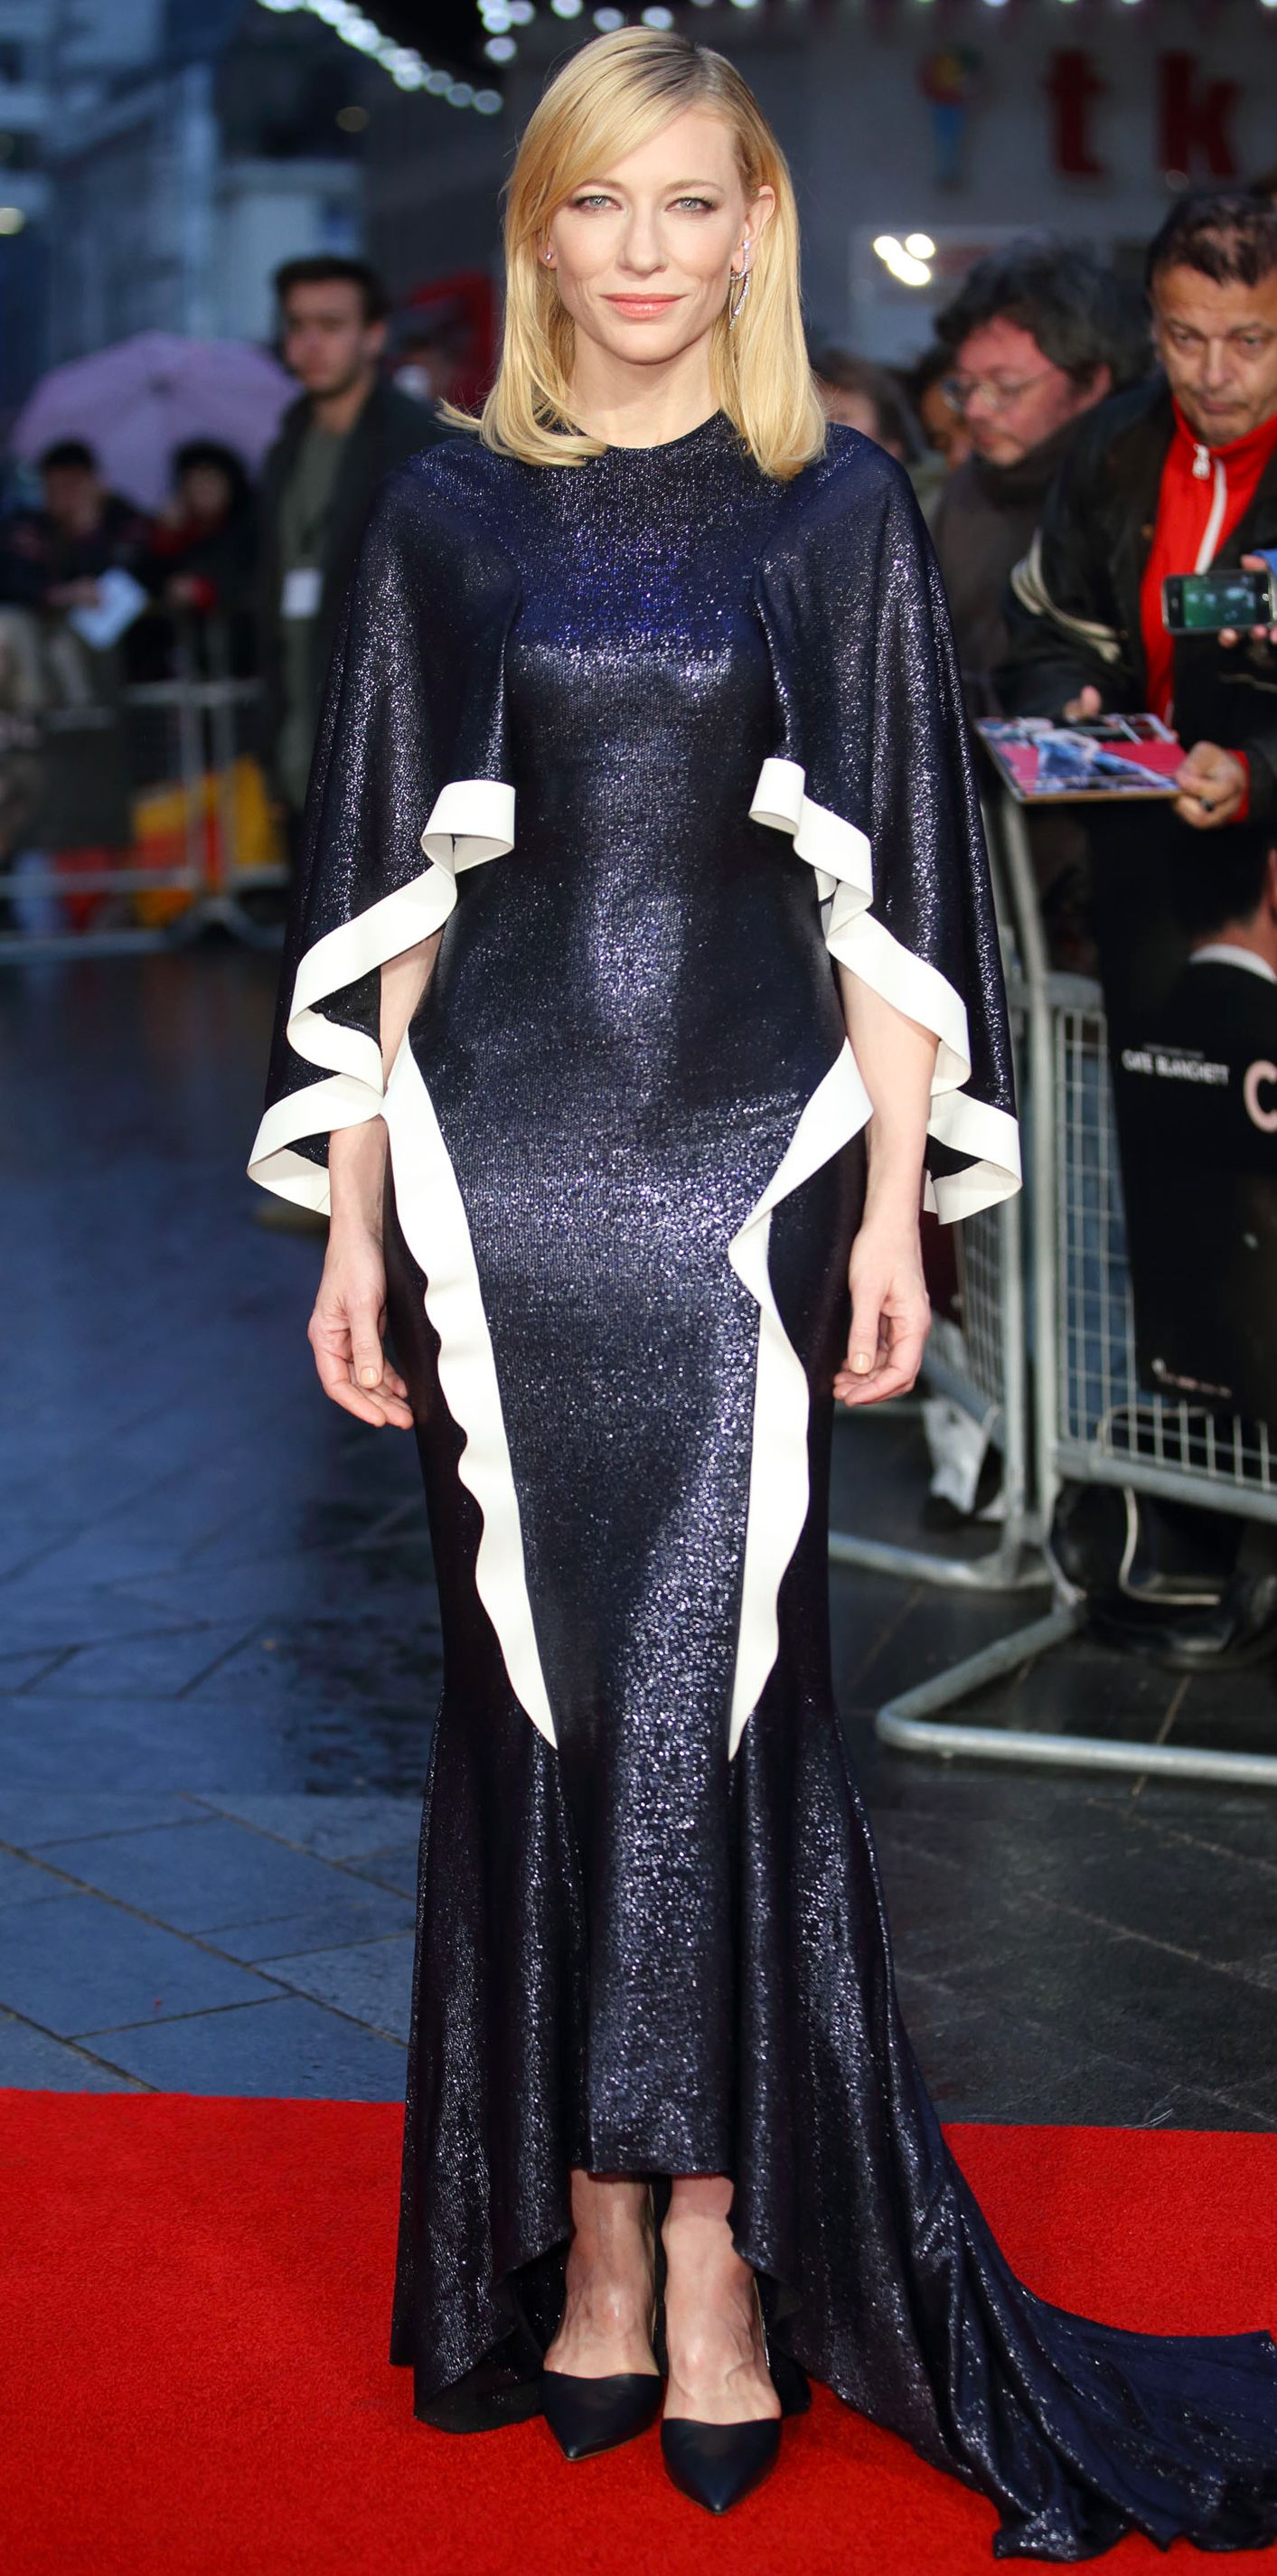 Cate Blanchett Red Carpet Suit